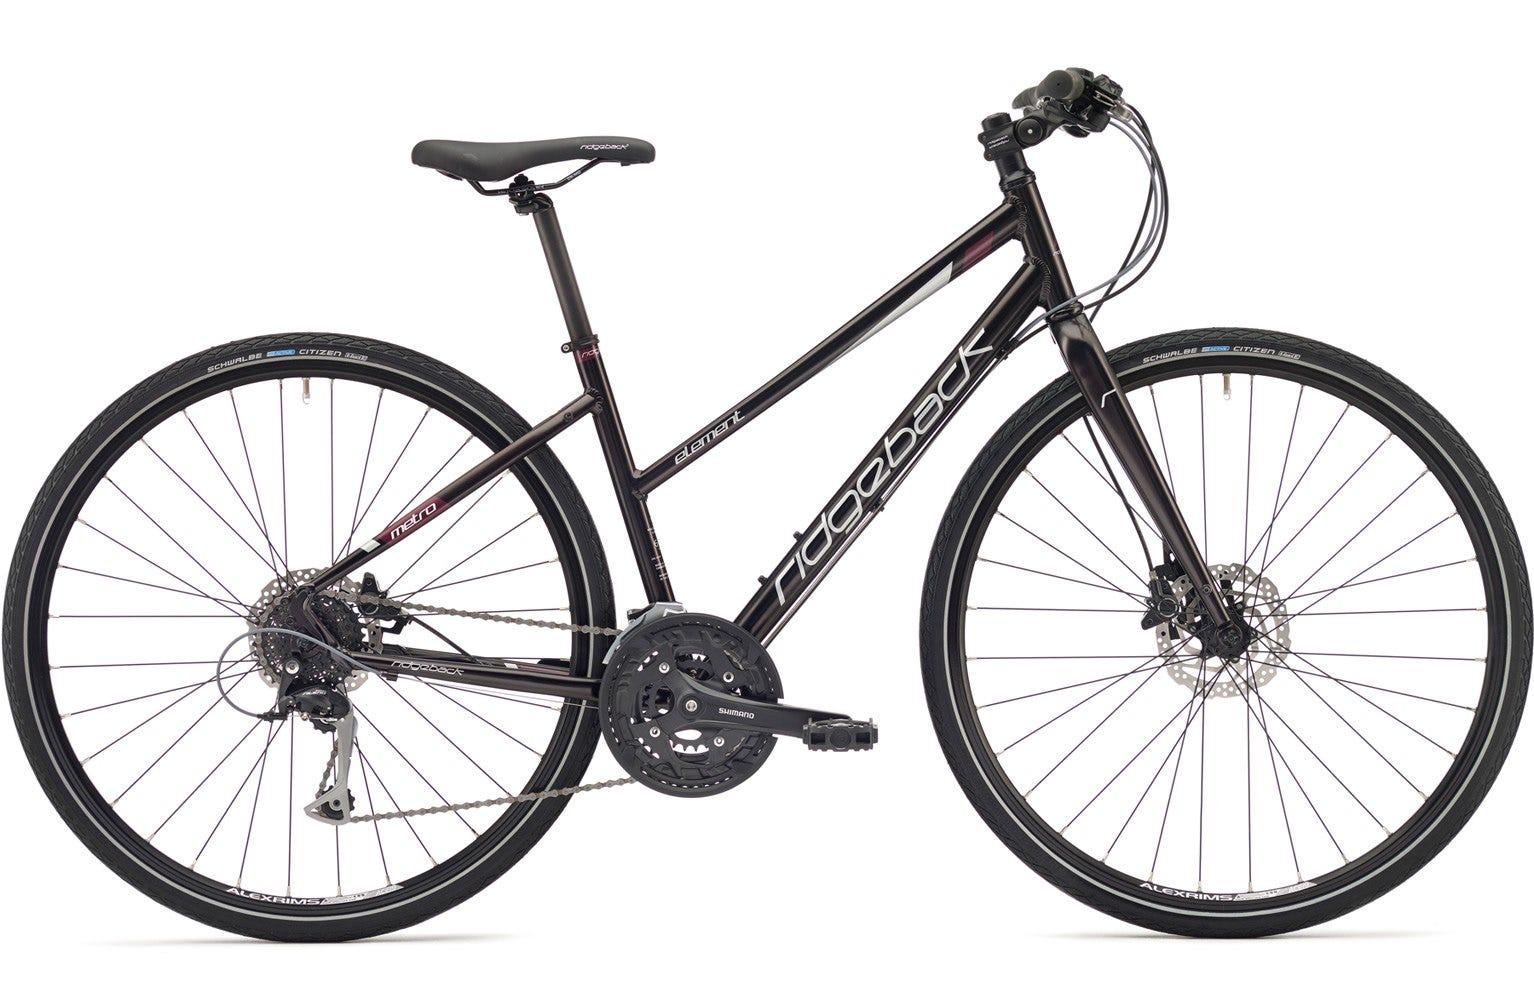 Ridgeback Element open frame 17 inch bike ex display